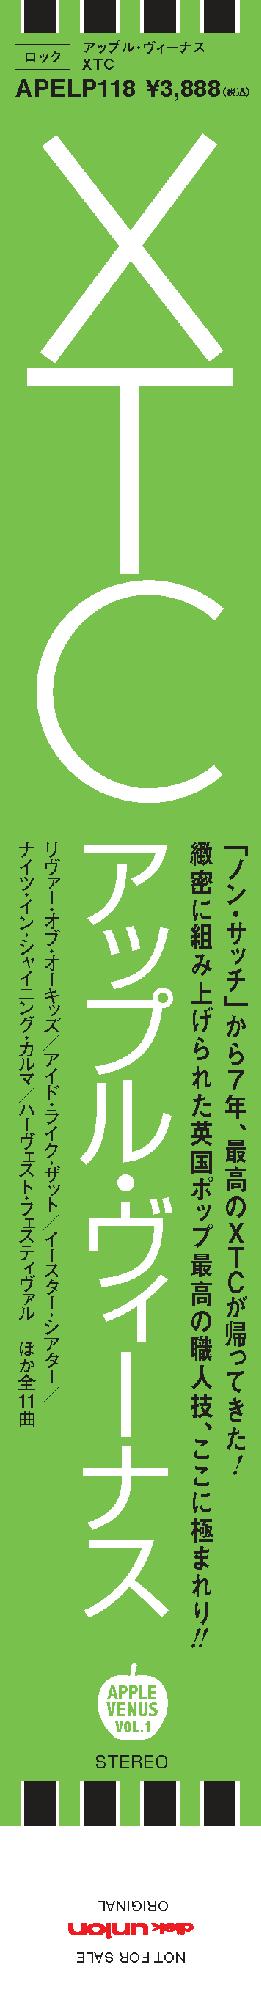 https://diskunion.net/rock/st/images/xtc_apple_venus_obi.png